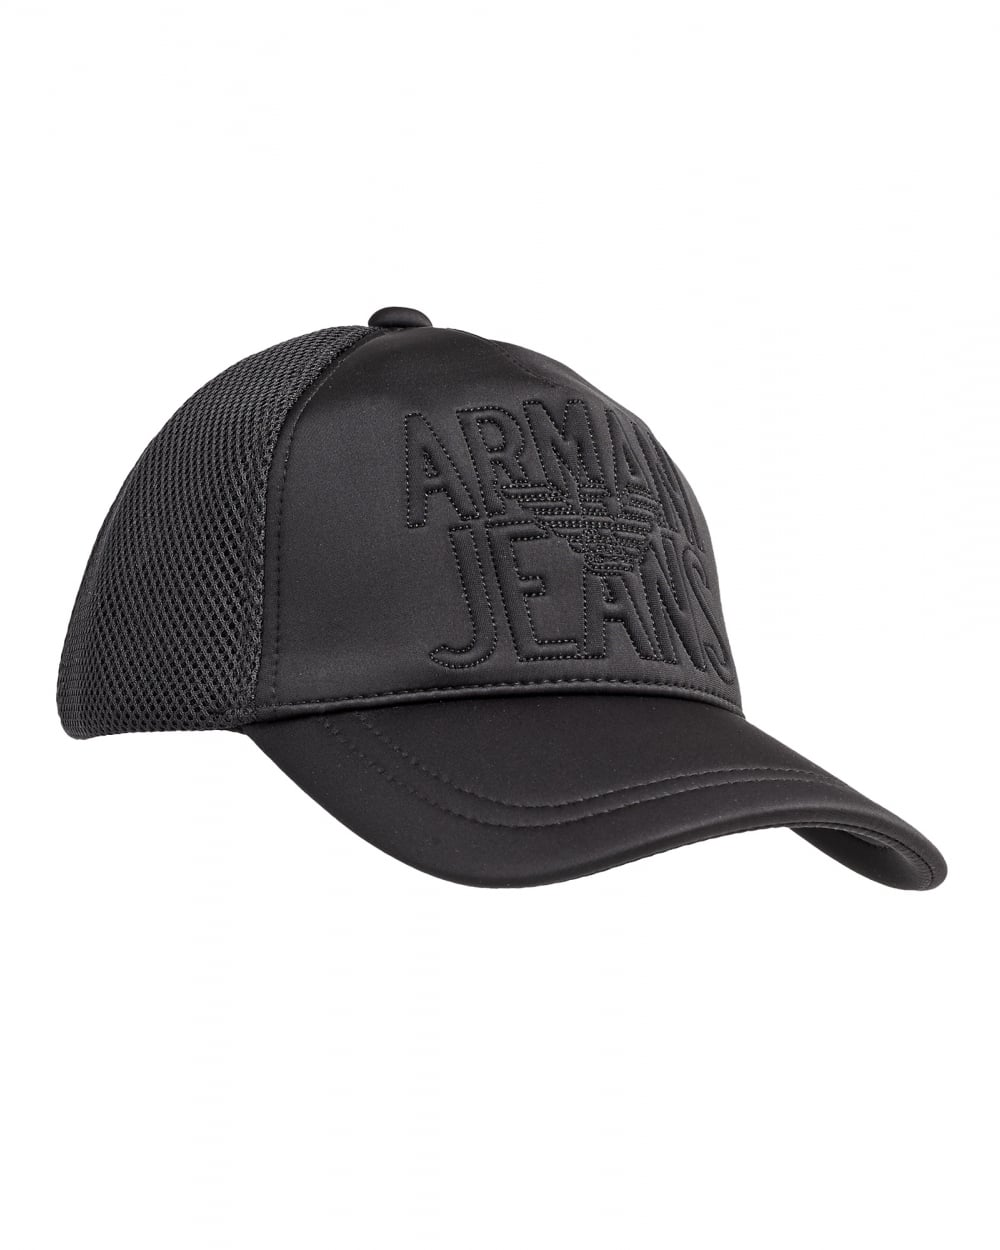 Armani Jeans Mens Hat d36c5befe03